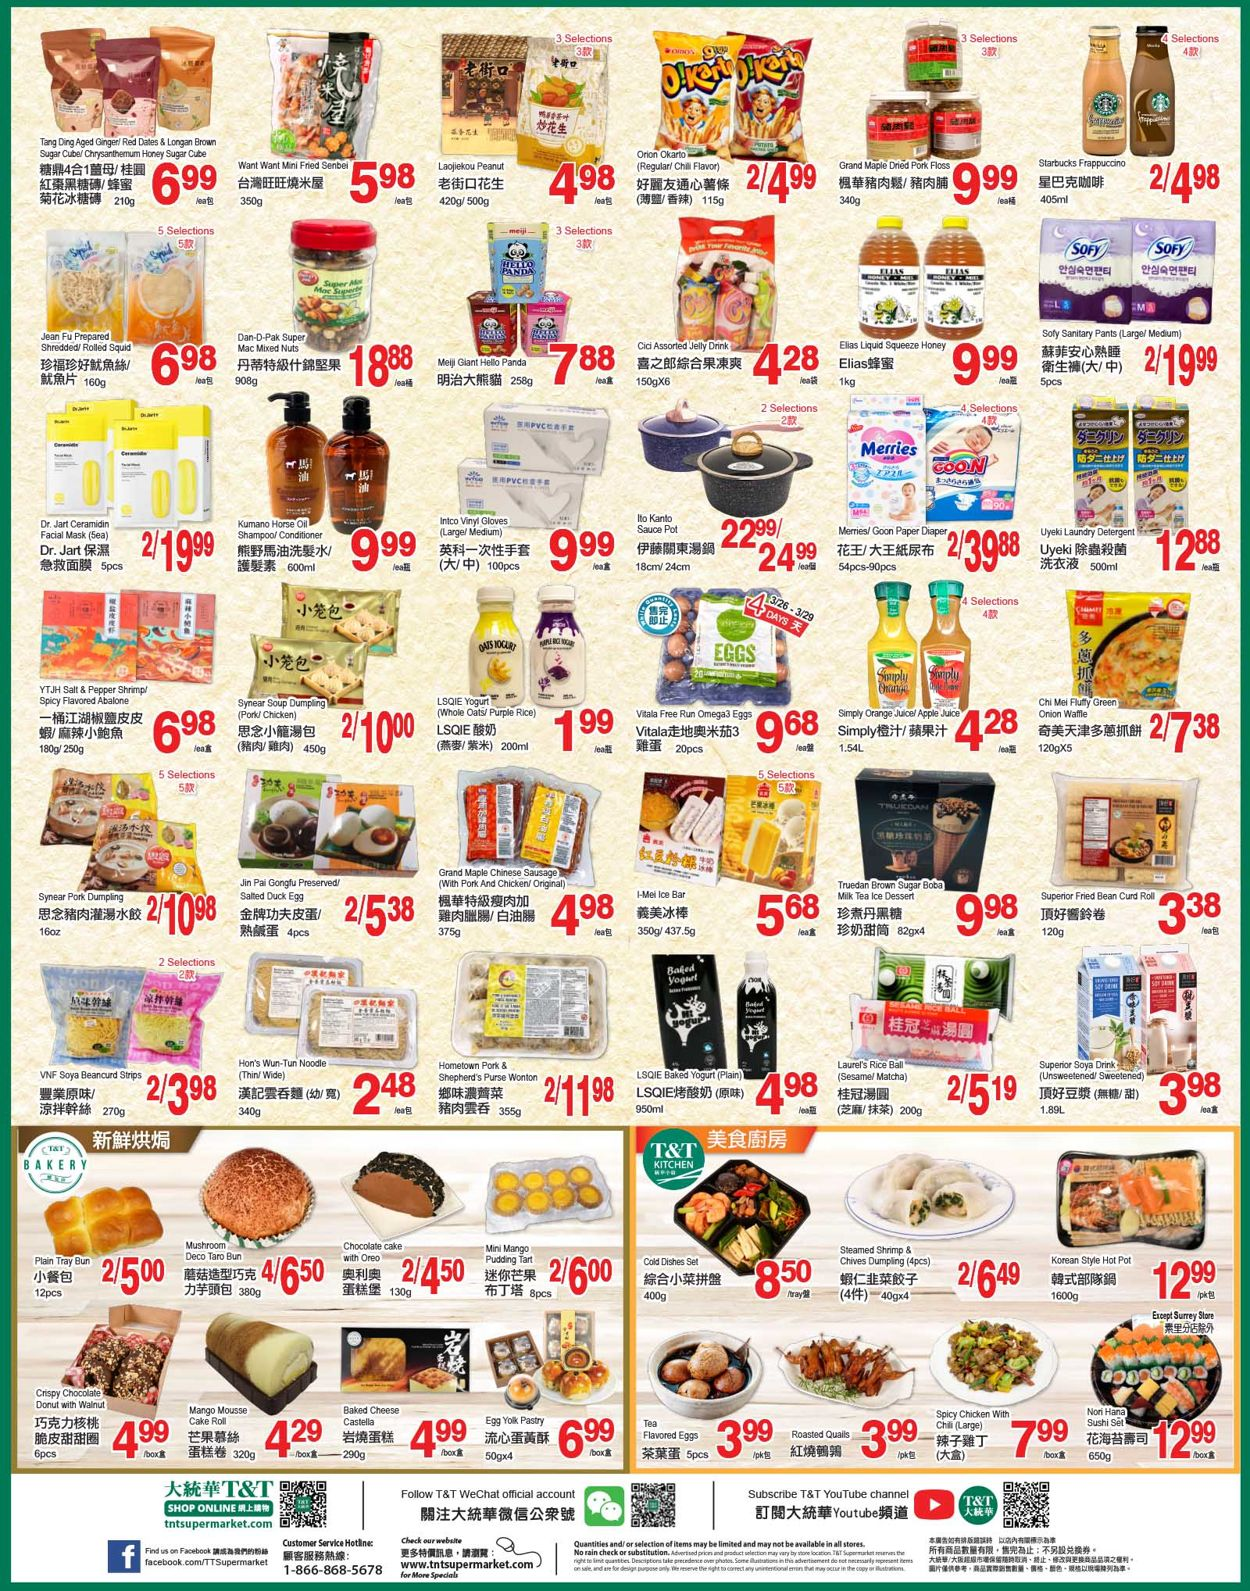 T&T Supermarket - British Columbia Flyer - 03/26-04/15/2021 (Page 3)